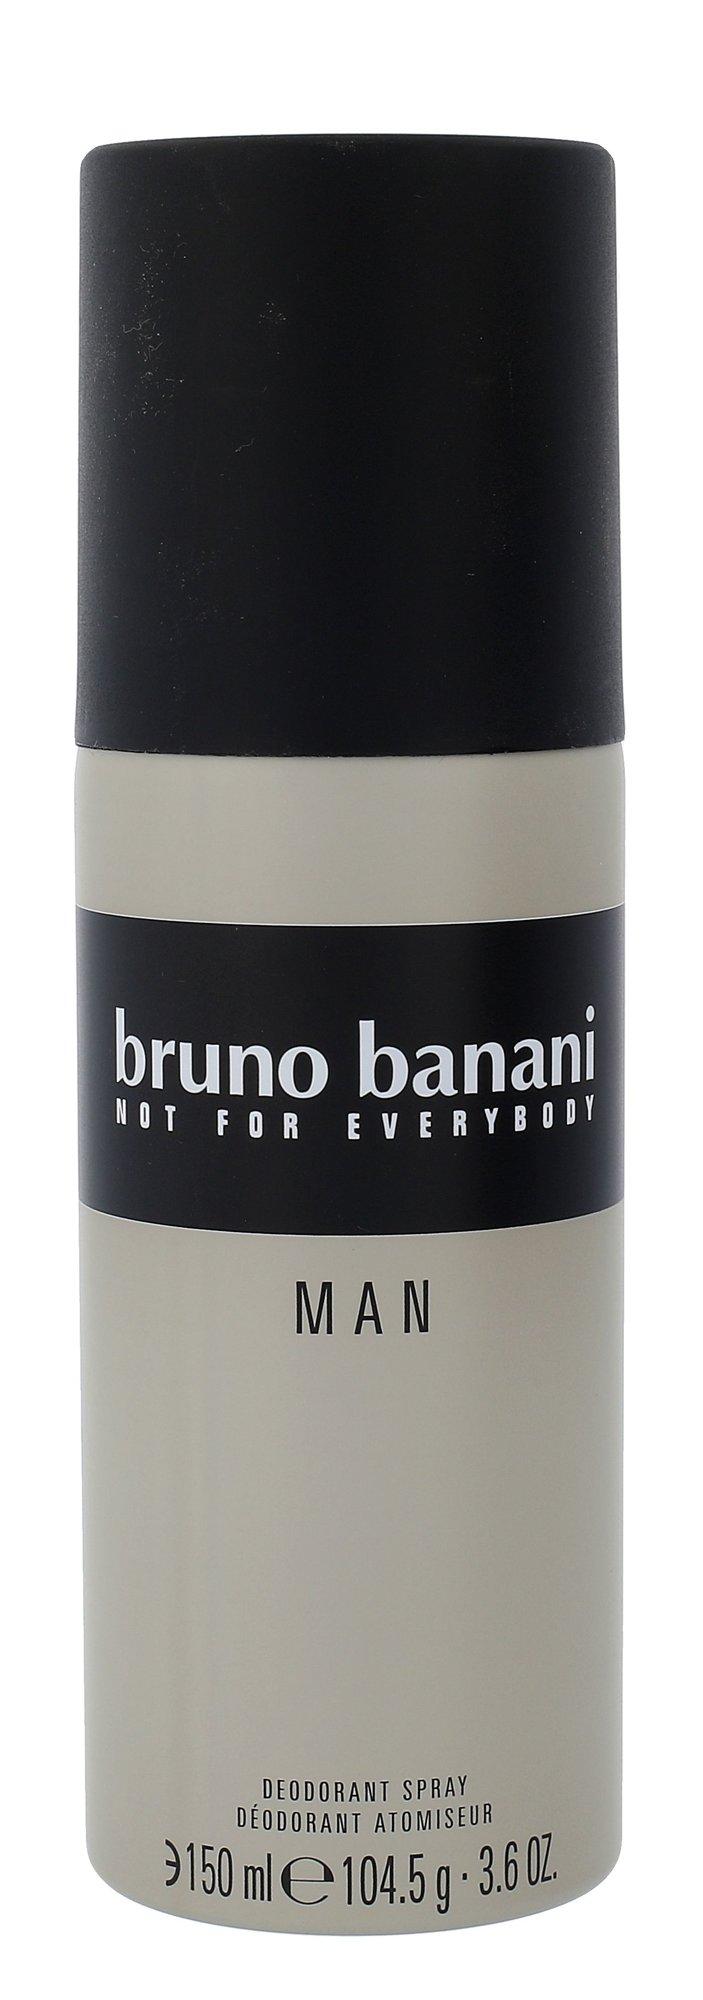 Bruno Banani Man Deodorant 150ml